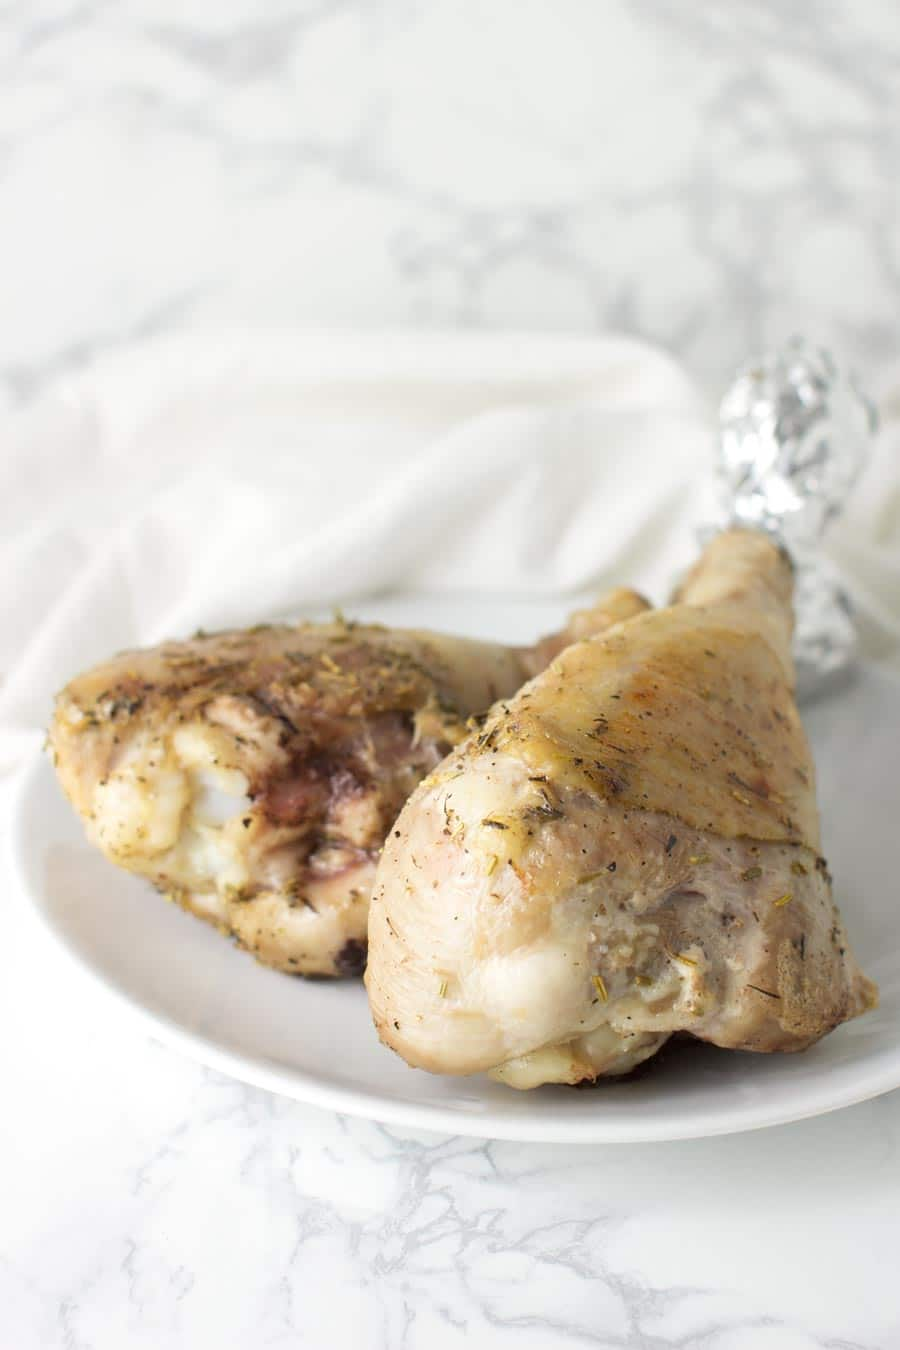 Turkey Legs recipe from acleanplate.com #paleo #aip #autoimmuneprotocol